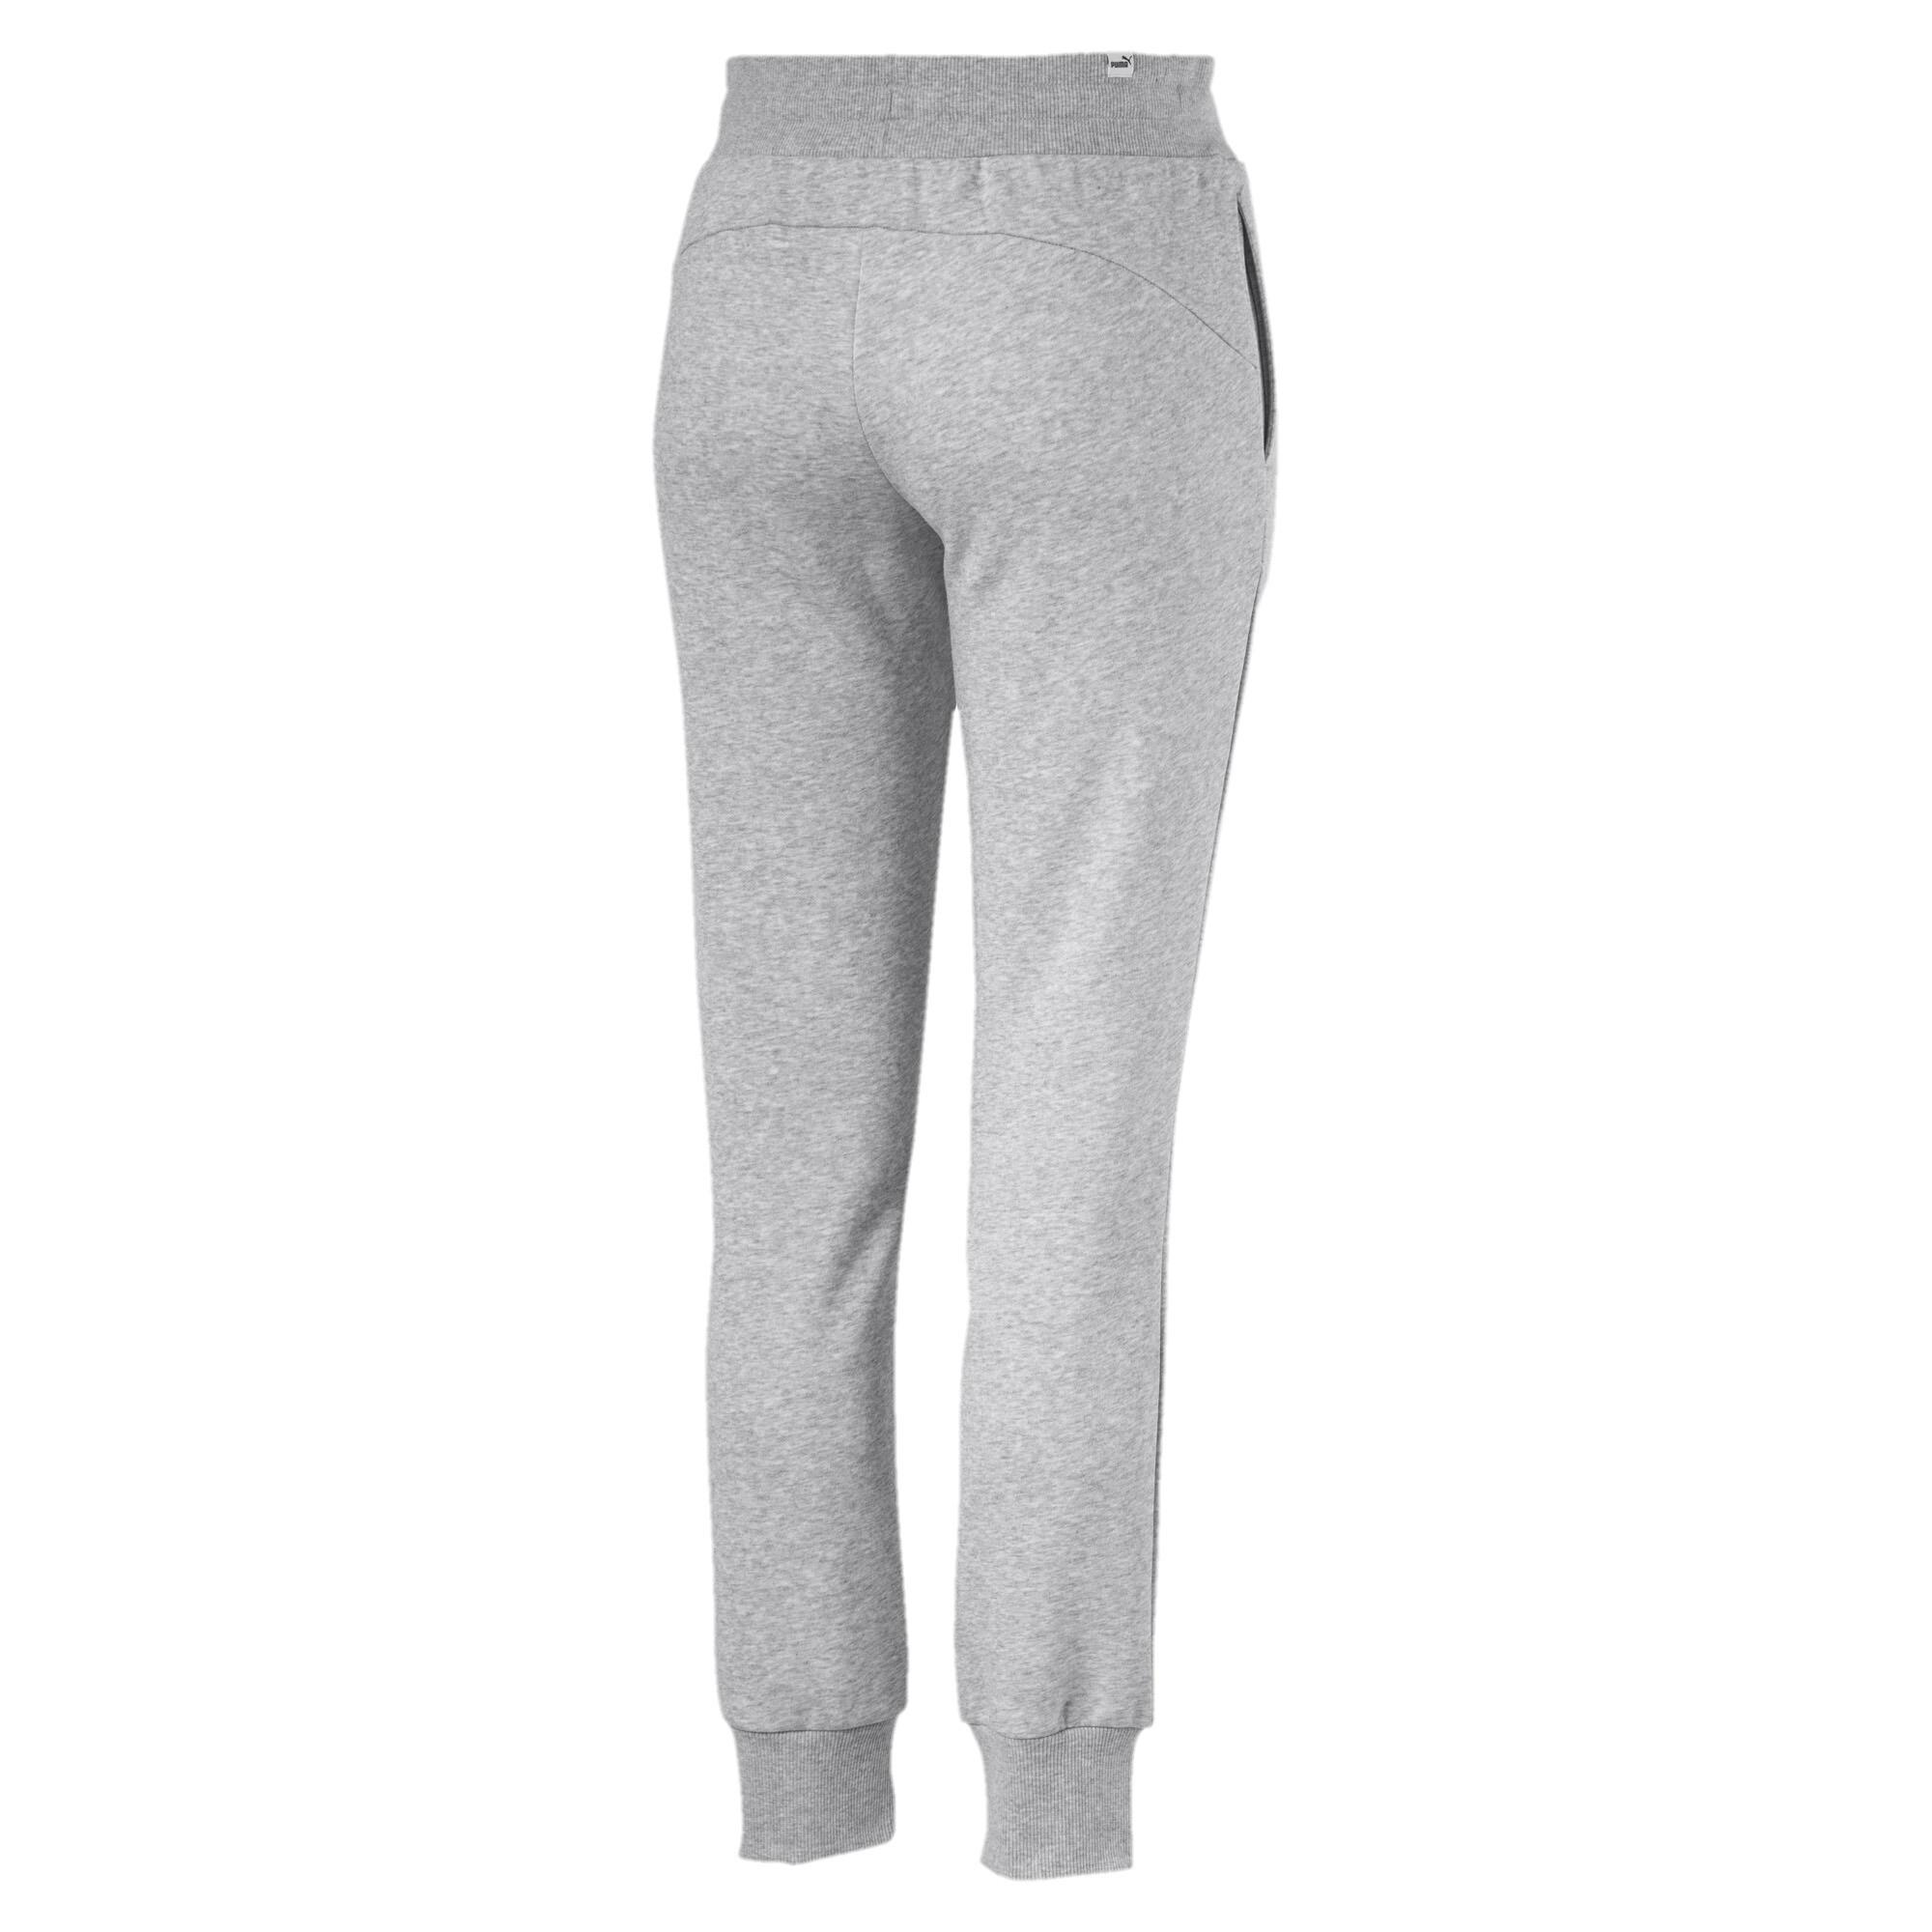 Pantalones deportivos Essentials para mujer